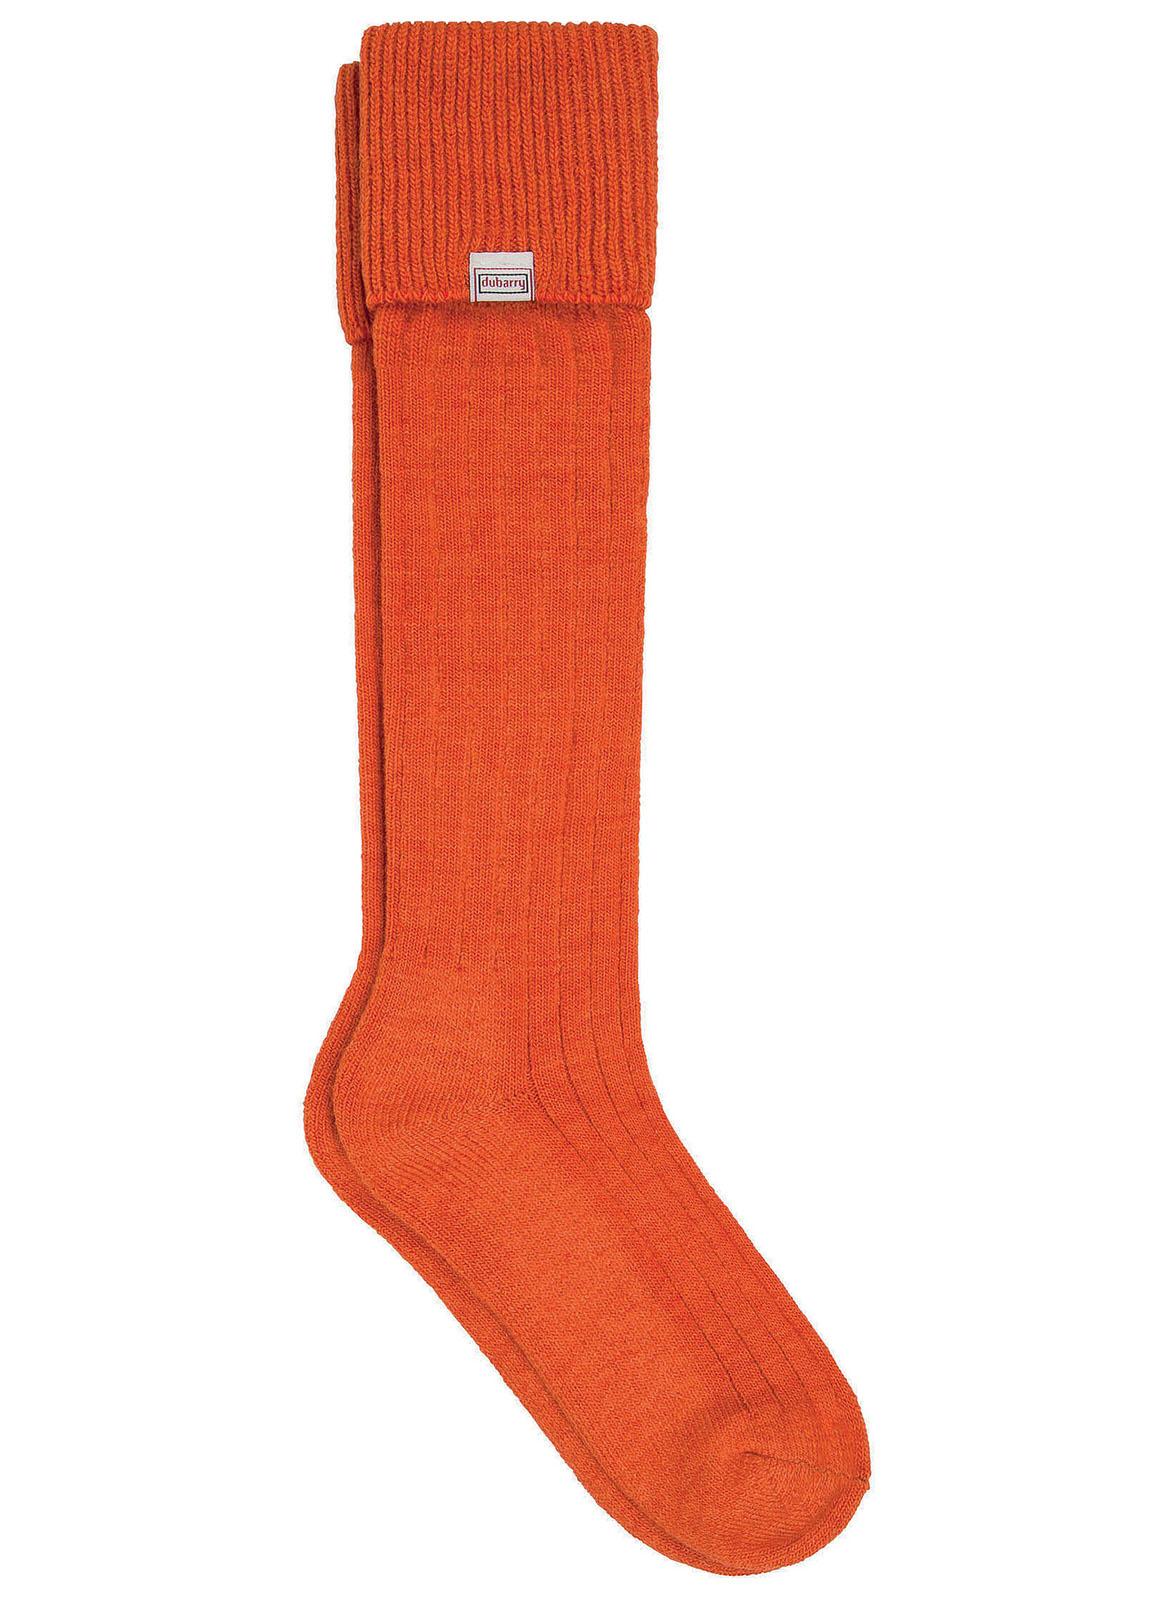 Alpaca_Socks_Terracotta_Image_1